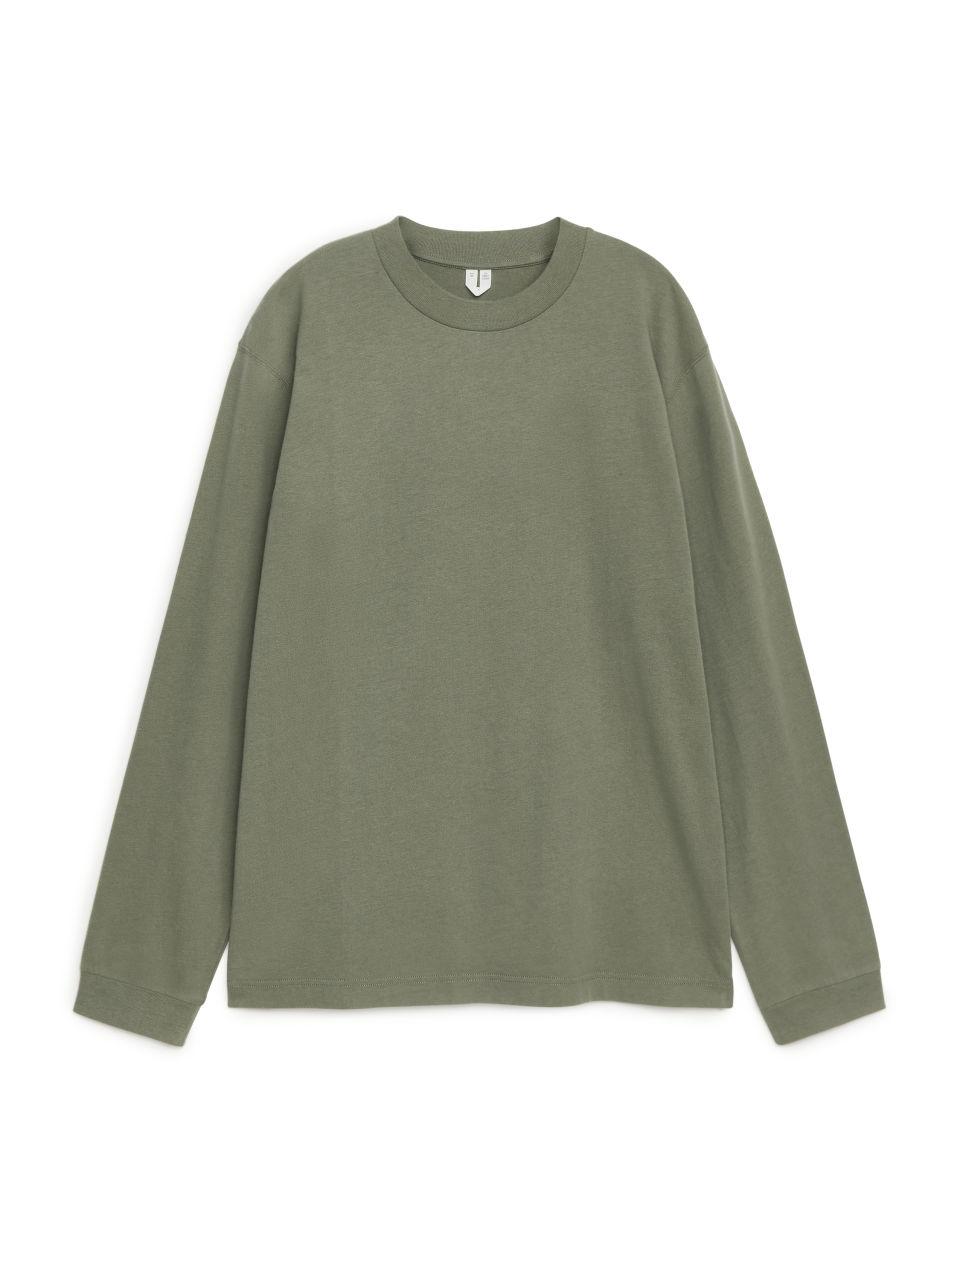 Long-Sleeved Organic Cotton T-Shirt - Green